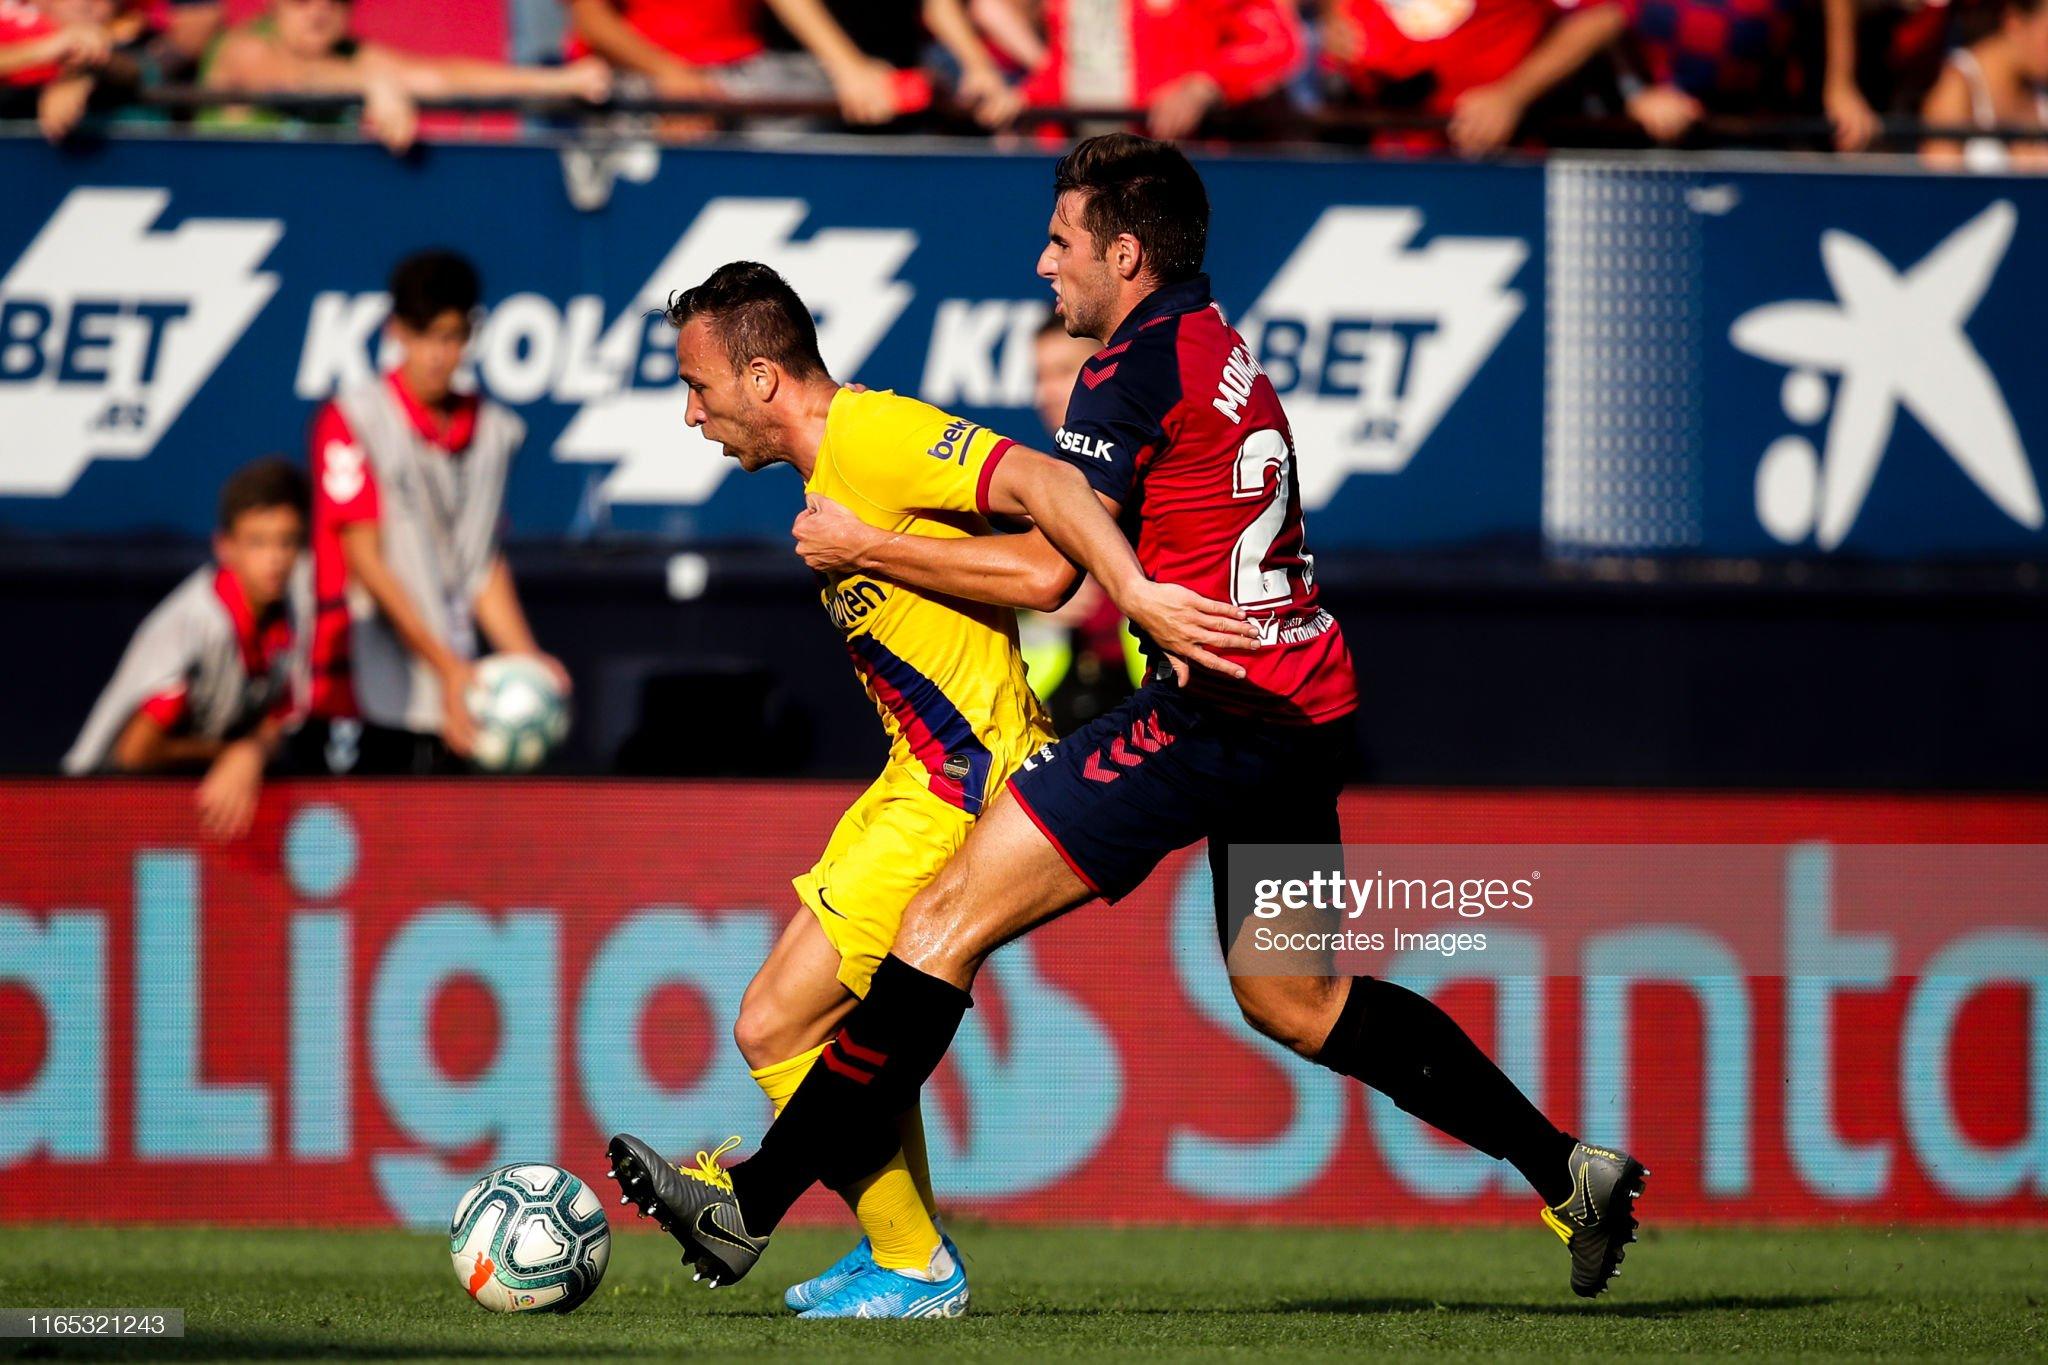 صور مباراة : أوساسونا - برشلونة 2-2 ( 31-08-2019 )  Arthur-of-fc-barcelona-nacho-vidal-of-ca-osasuna-during-the-la-liga-picture-id1165321243?s=2048x2048